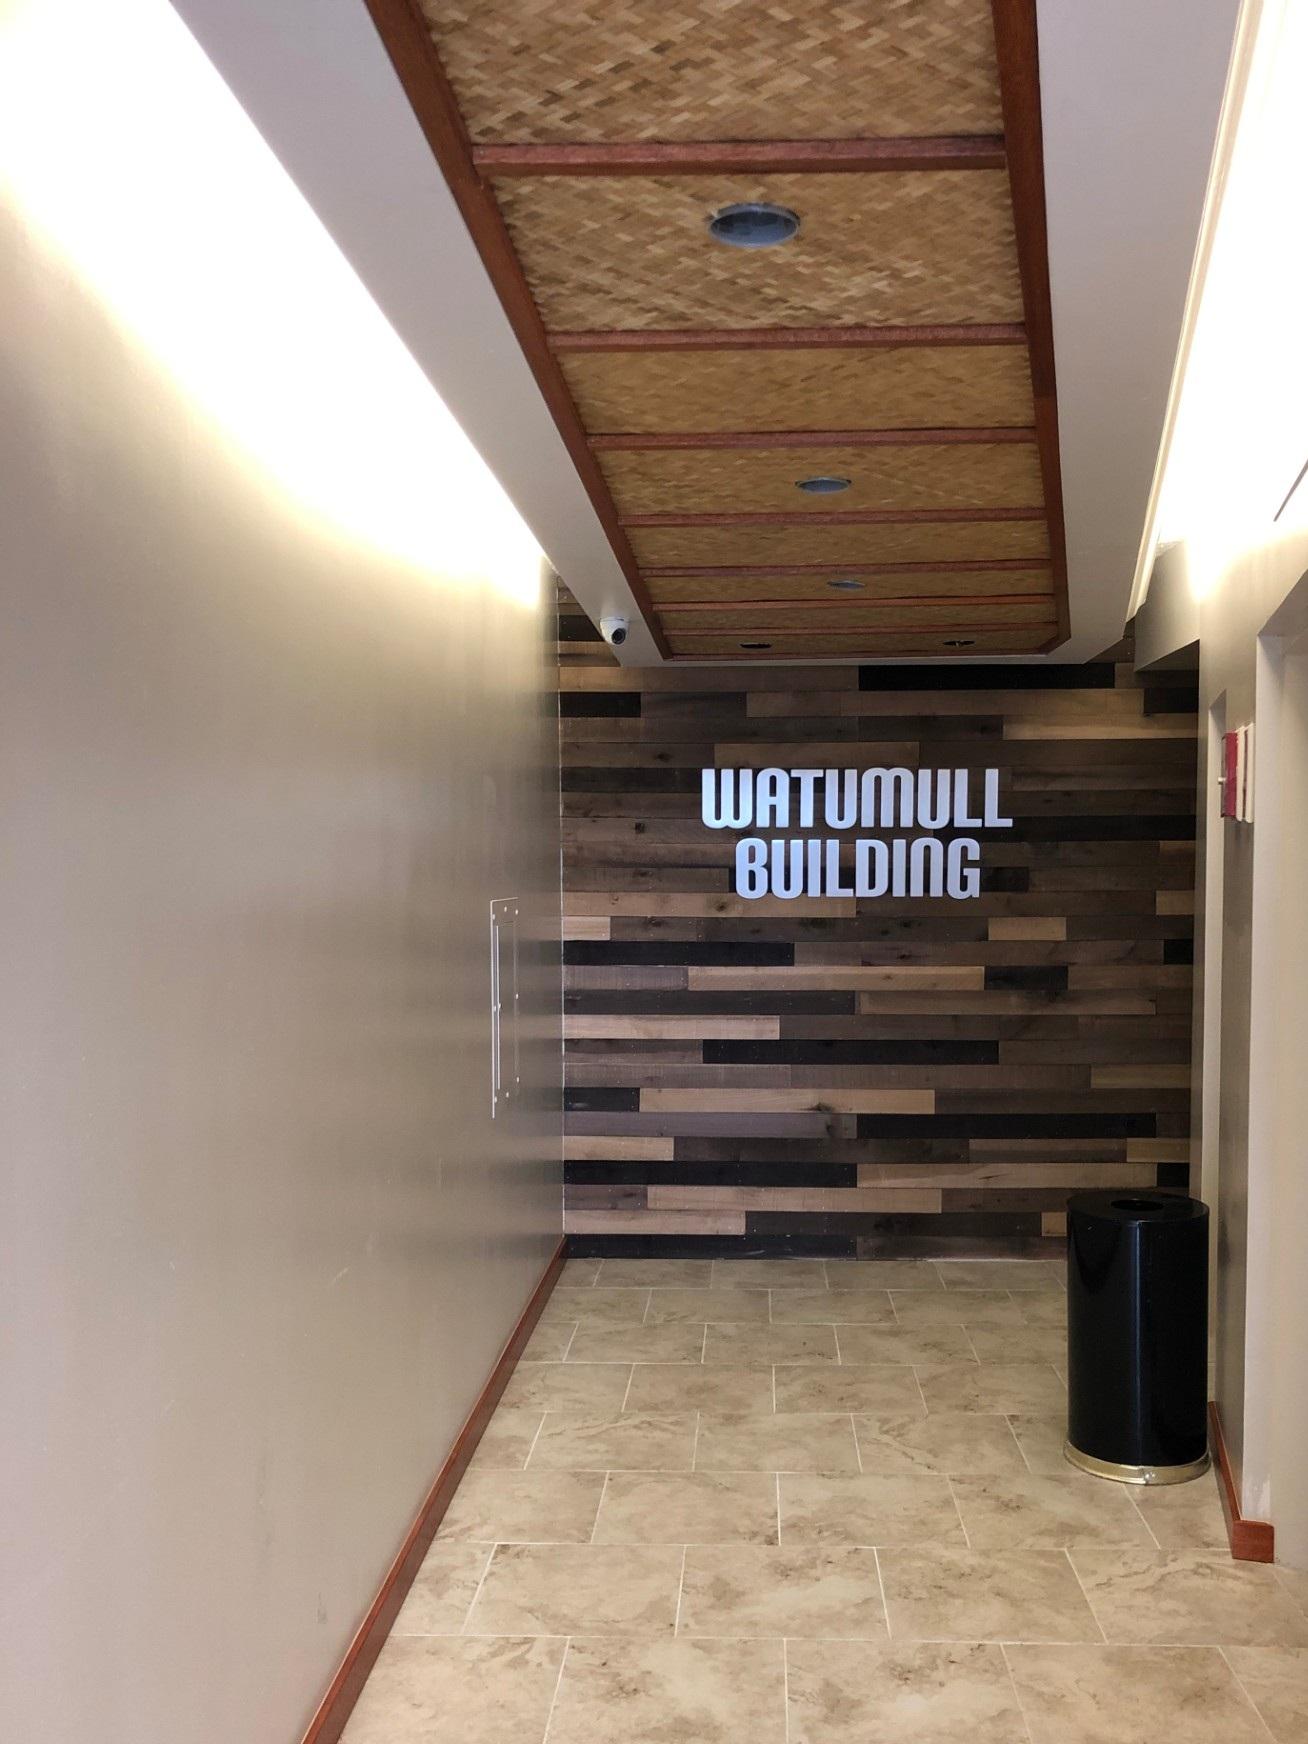 Watamull Building